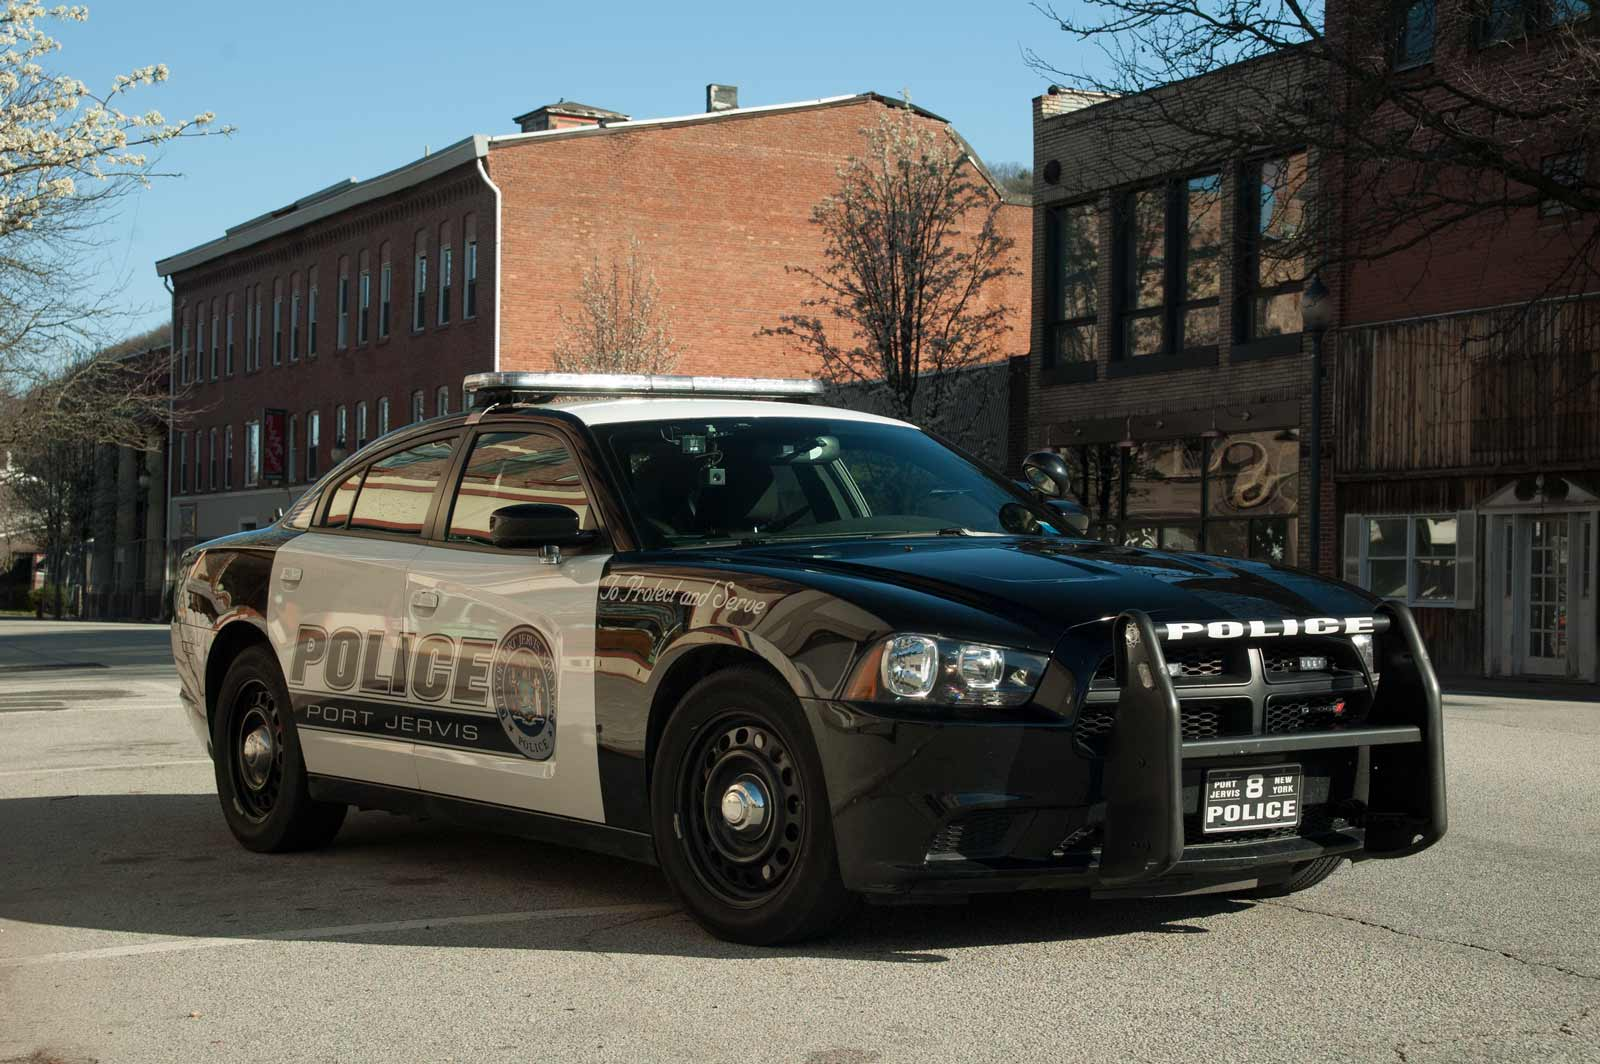 PJPD Police Car